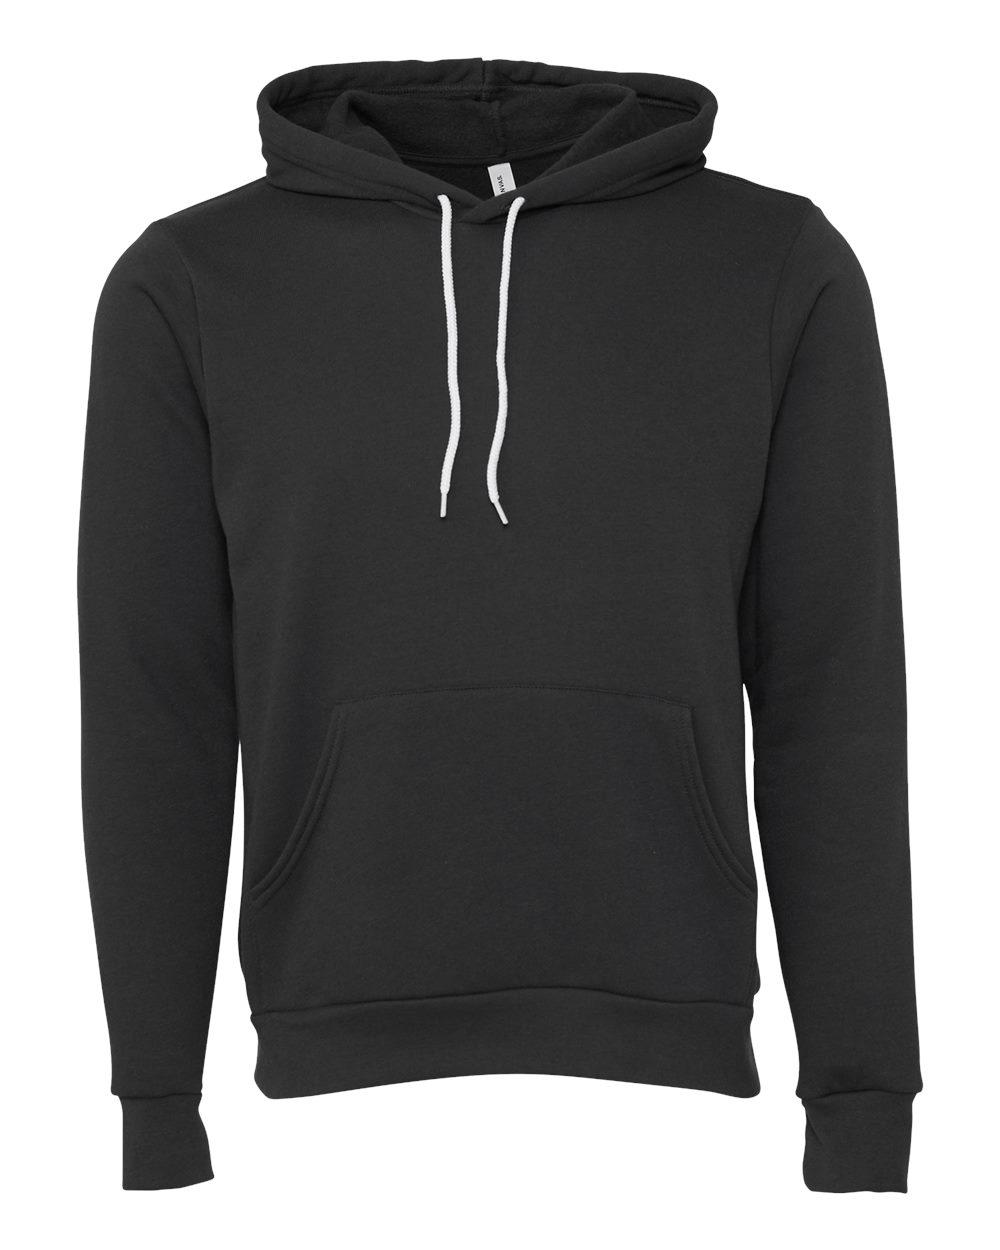 Bella-Canvas-Unisex-Sponge-Hooded-Pullover-Sweatshirt-Blank-3719-up-to-2XL thumbnail 31